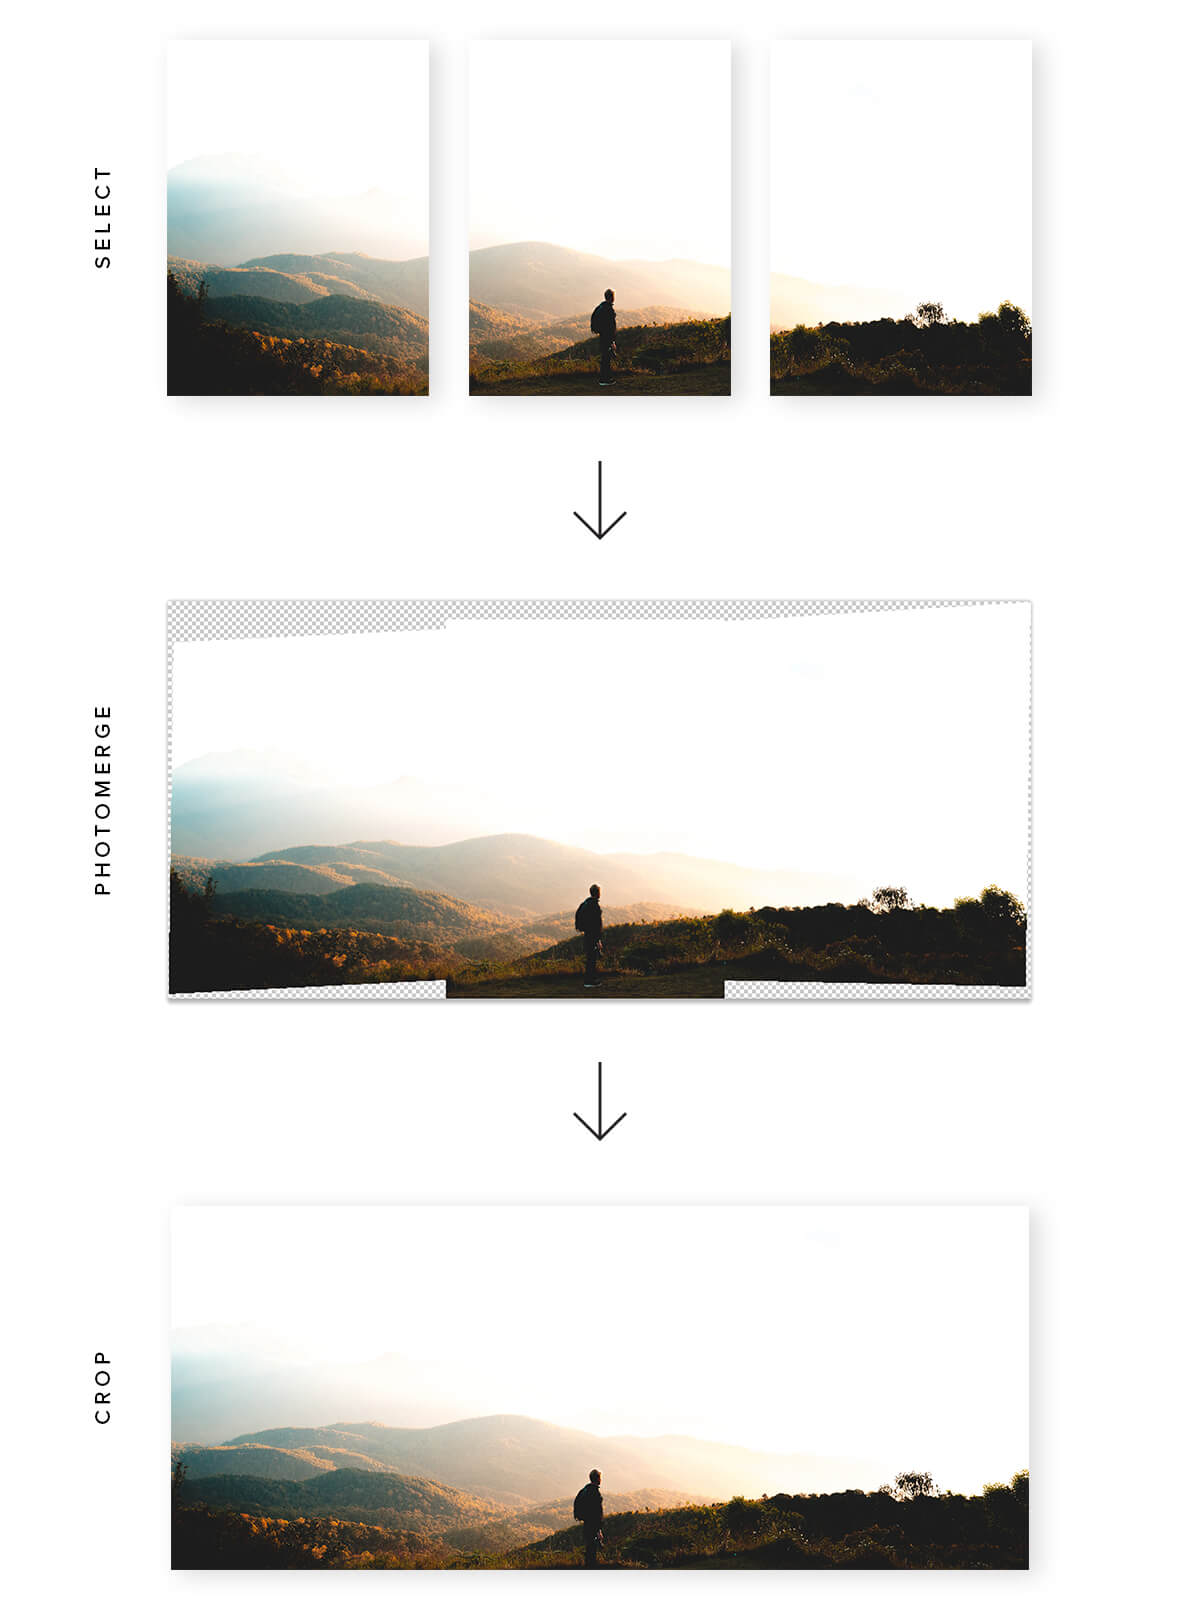 Three steps to using Photomerge